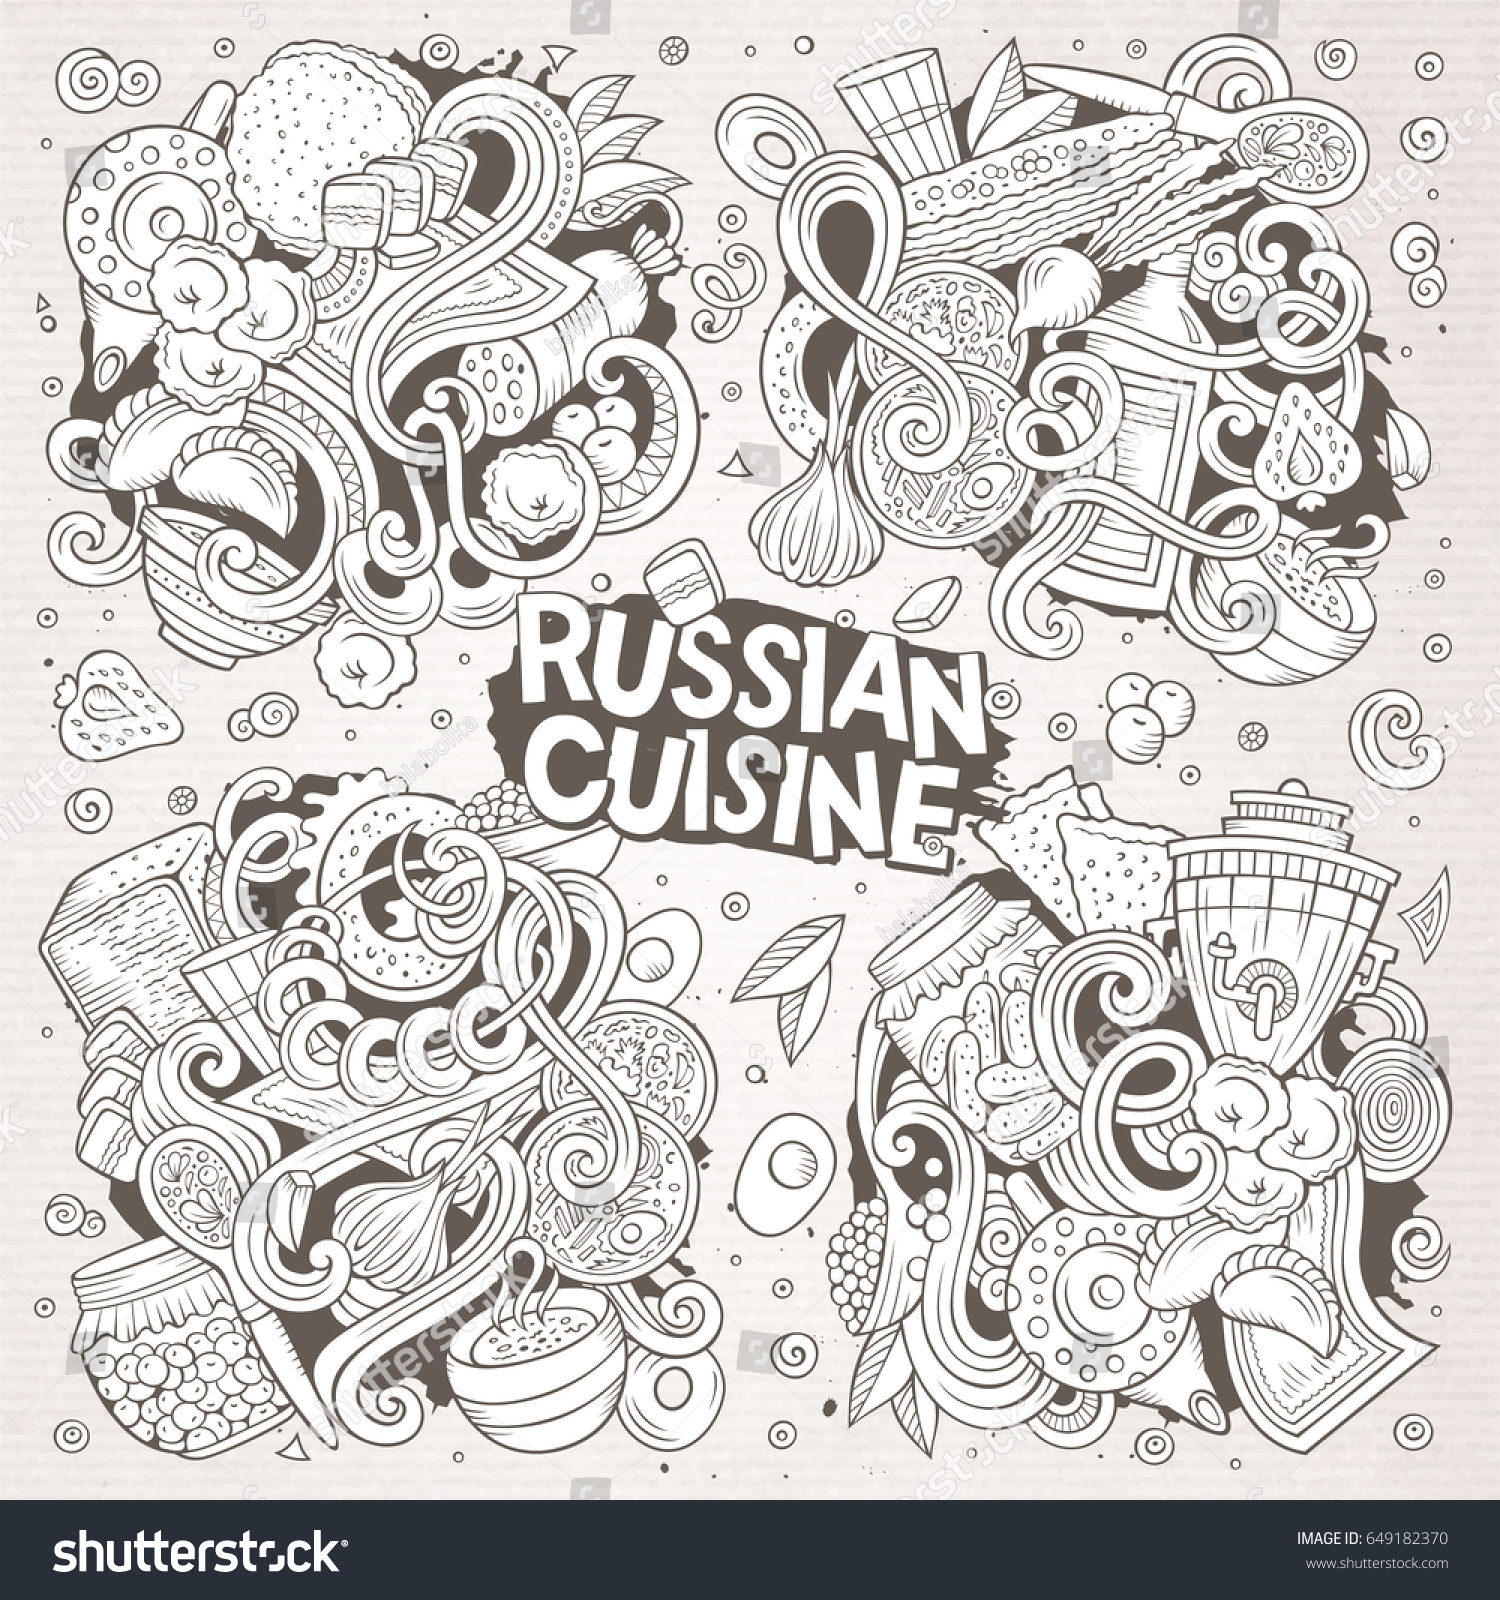 Vector line art hand drawn doodle stock vector 649182370 for Art of russian cuisine